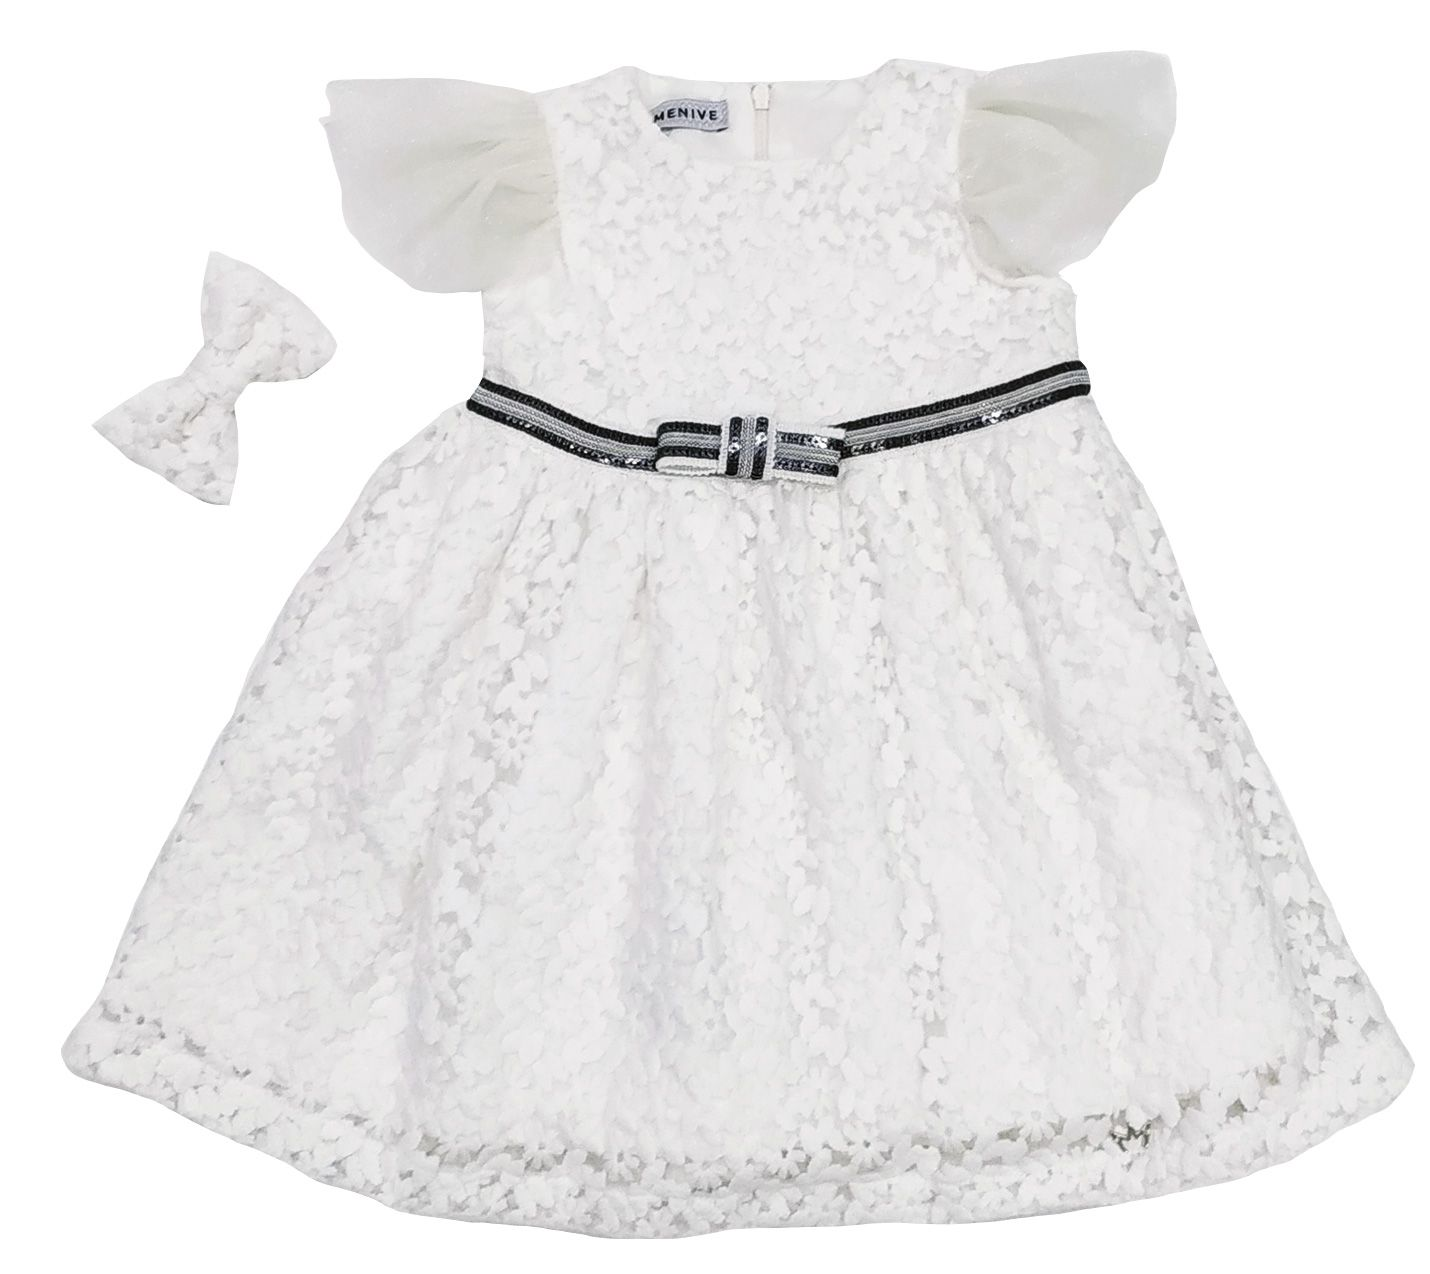 Vestido Chanel - Renda Laço Perola Mais Bolsa